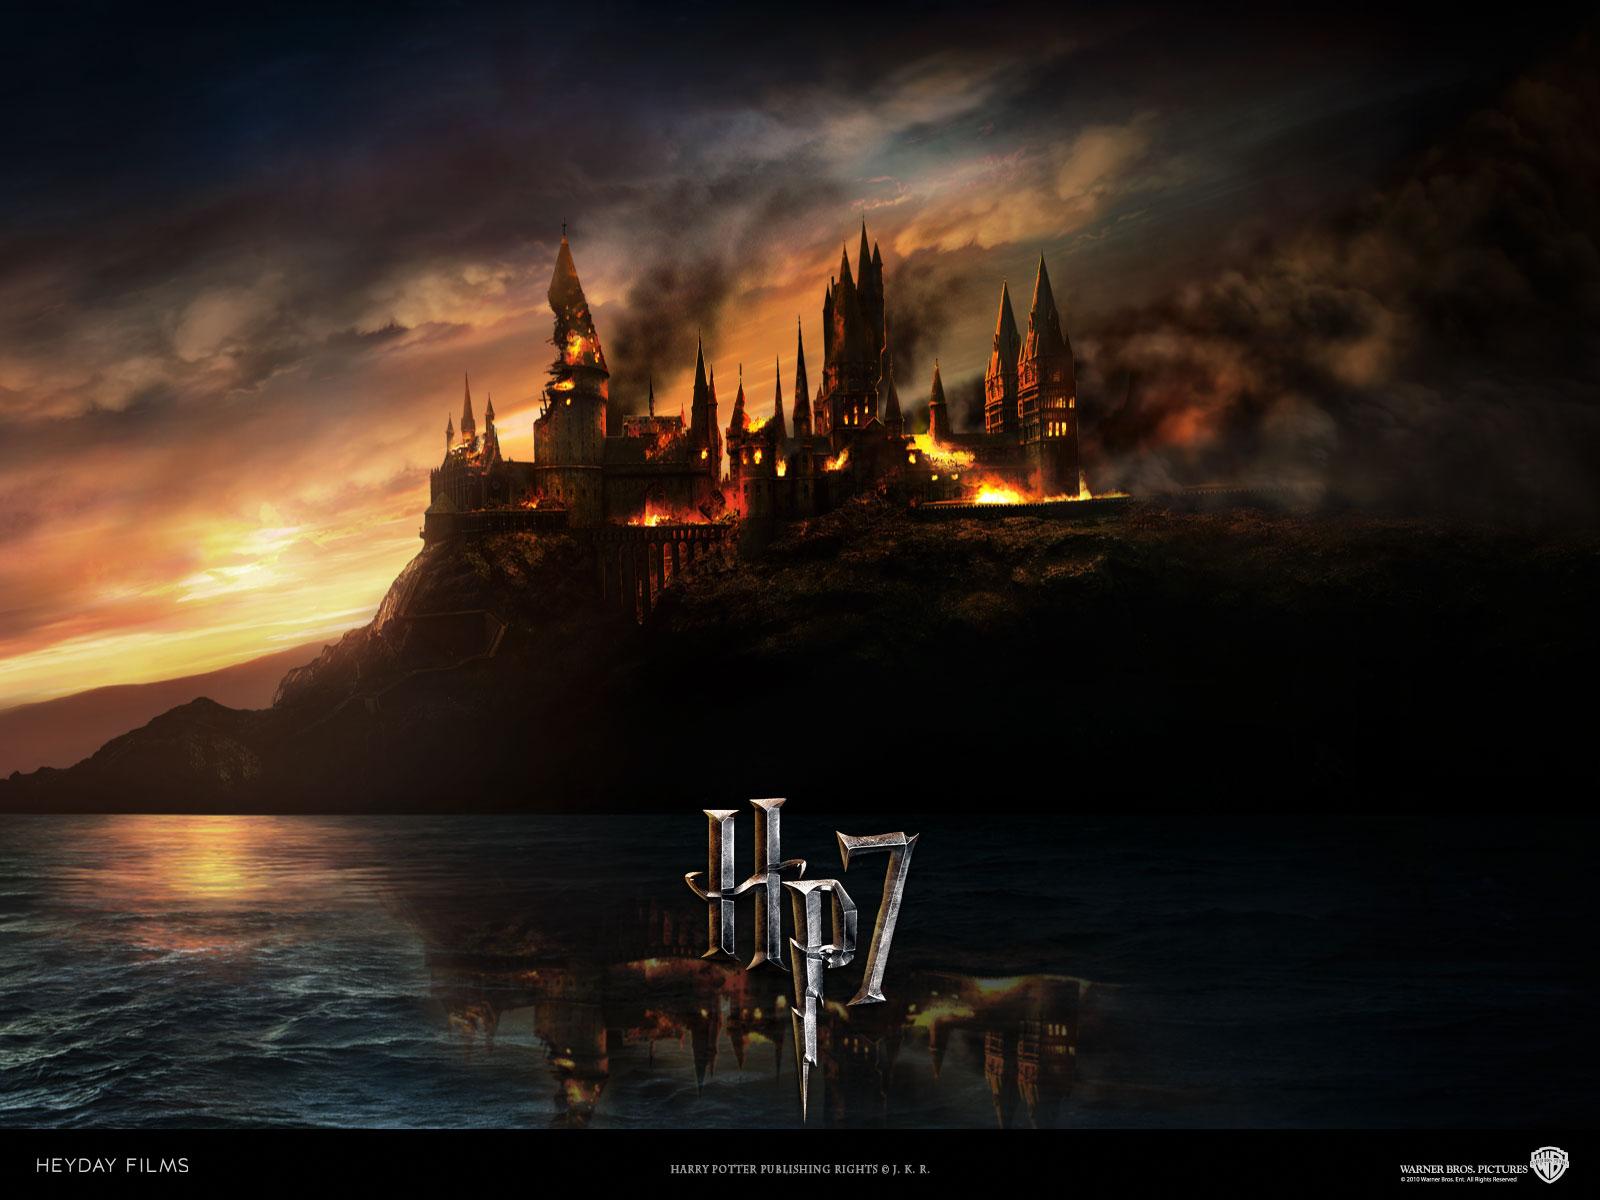 http://2.bp.blogspot.com/_MaVMibgGhdU/TOUUczO3H3I/AAAAAAAAGbQ/AjdD_e2Vm5k/s1600/HP7_harrypottereasreliquiasdamorte_wallpaper-burning-1600x1200.jpg